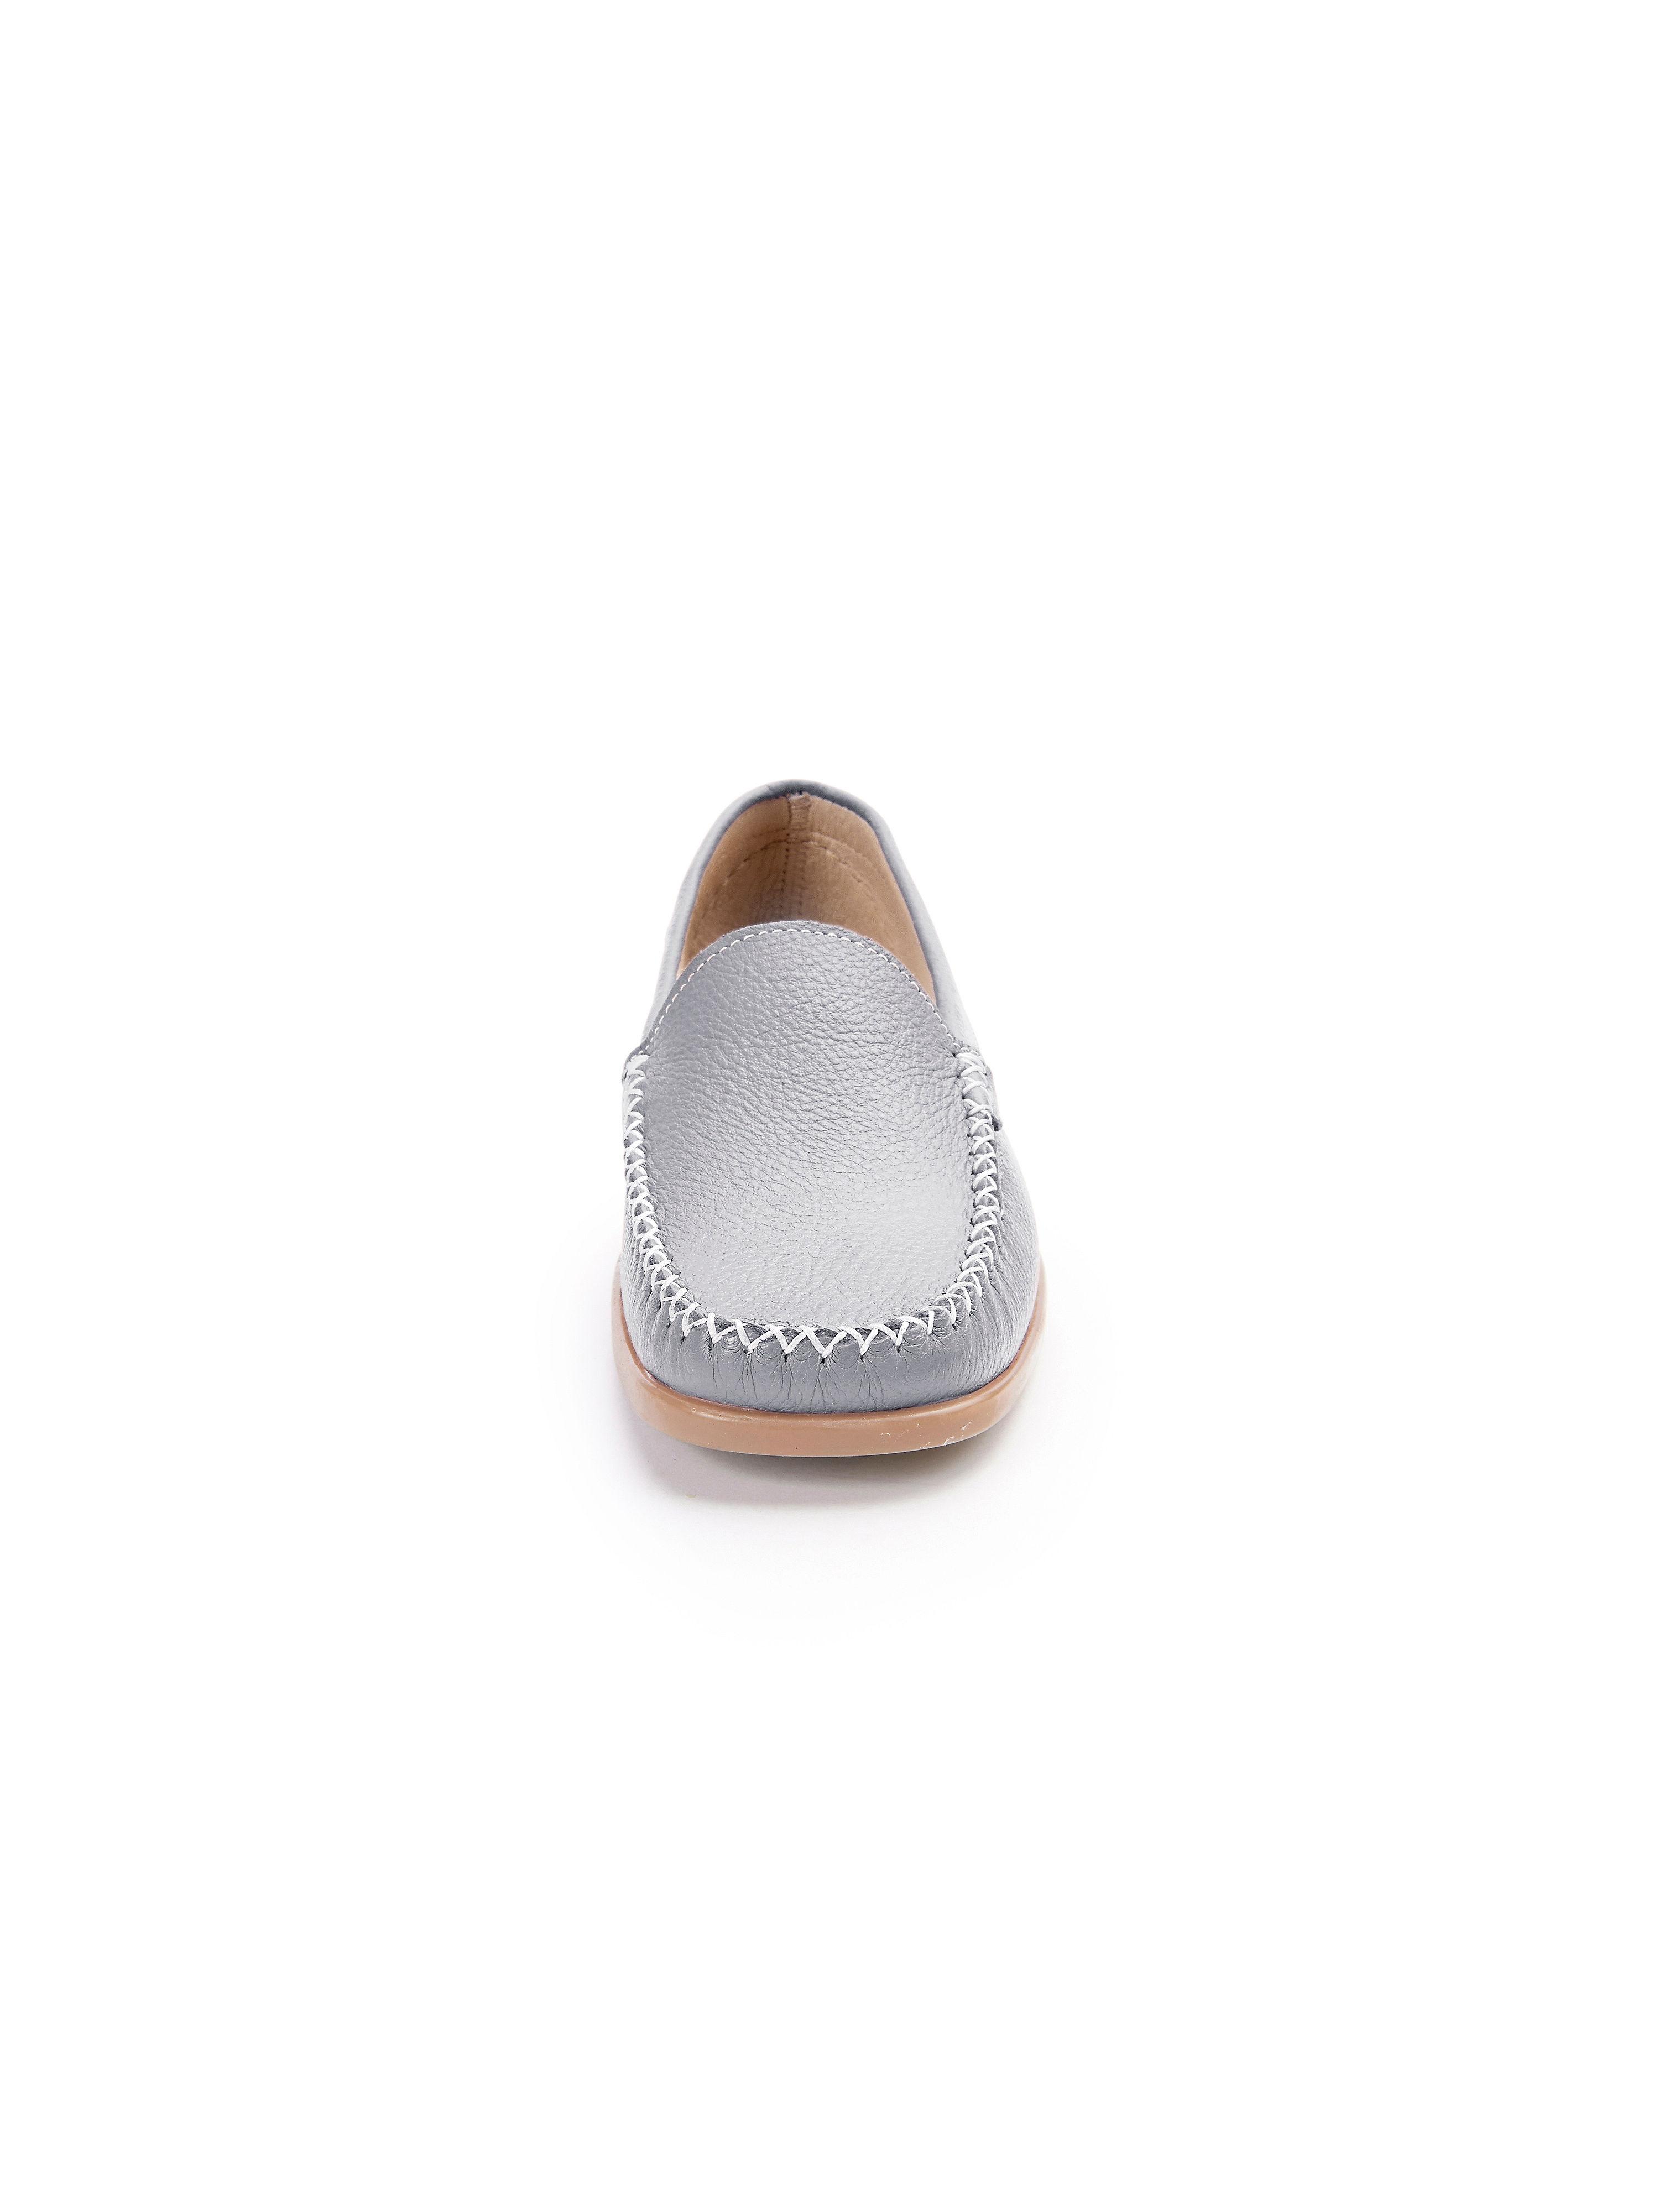 Peter Hahn - Mokassin Mokassin Mokassin aus 100% Leder - Silber Gute Qualität beliebte Schuhe 02b28e